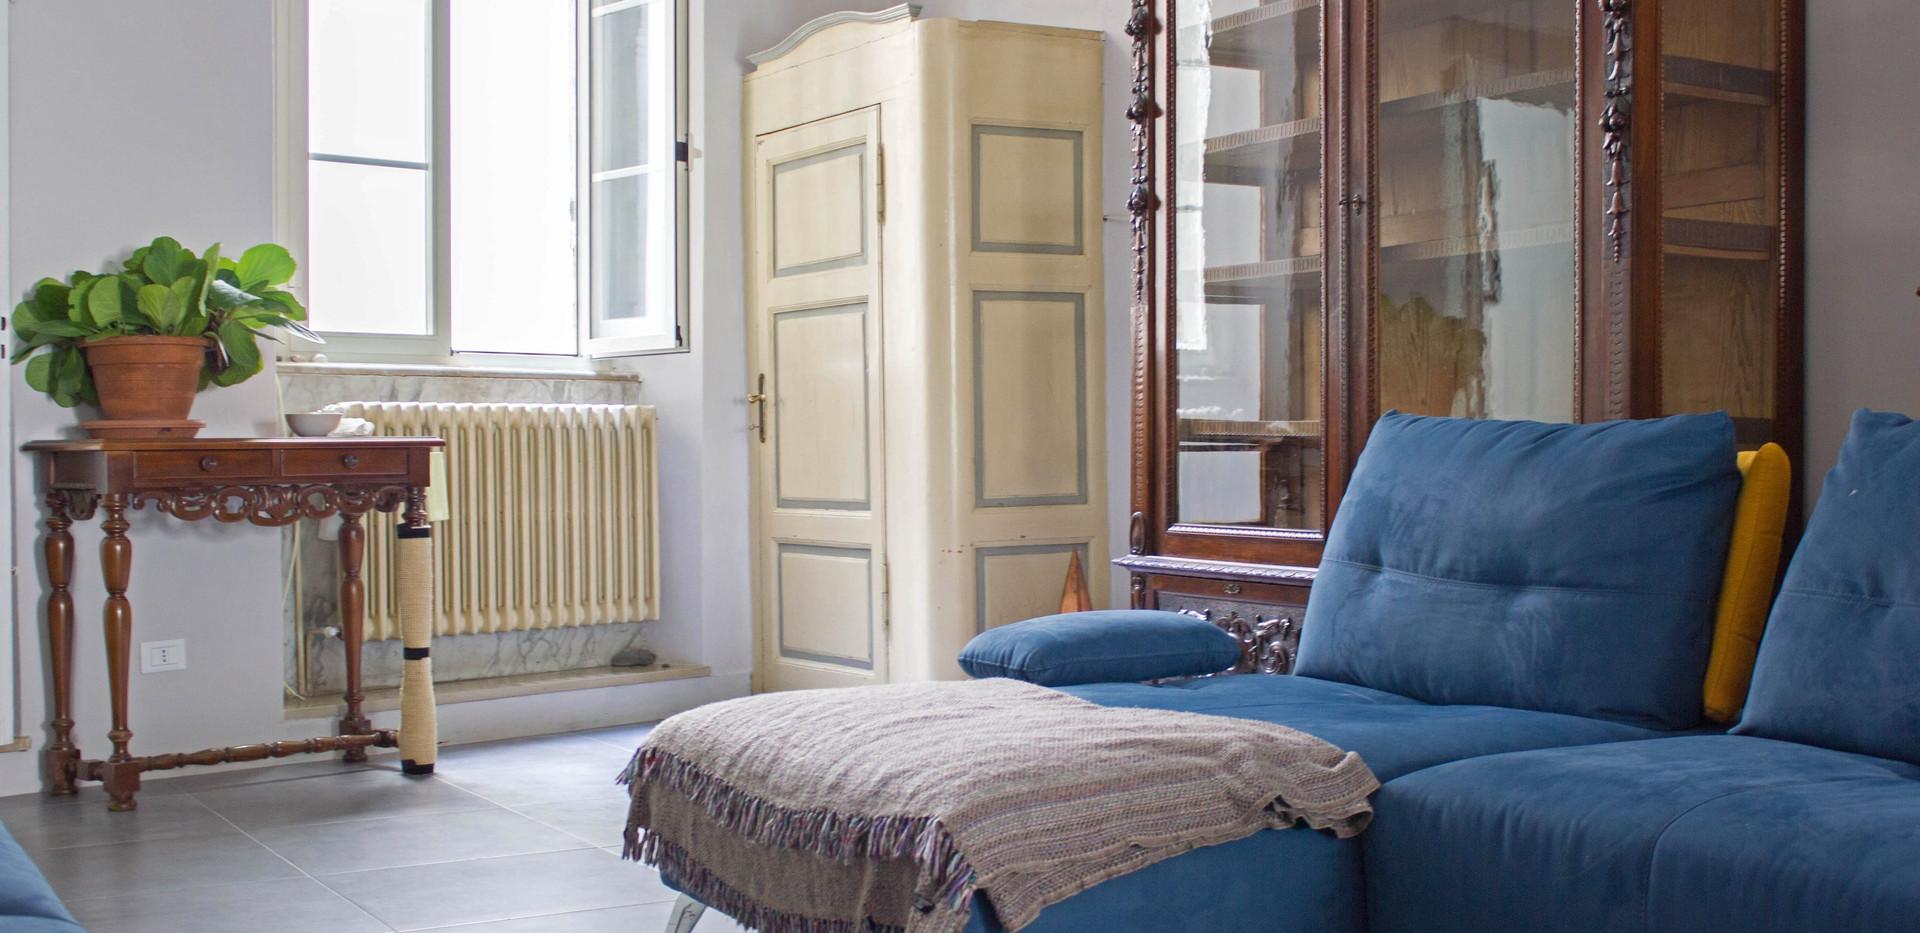 Lo scultore - Pontremoli - Living Room6.